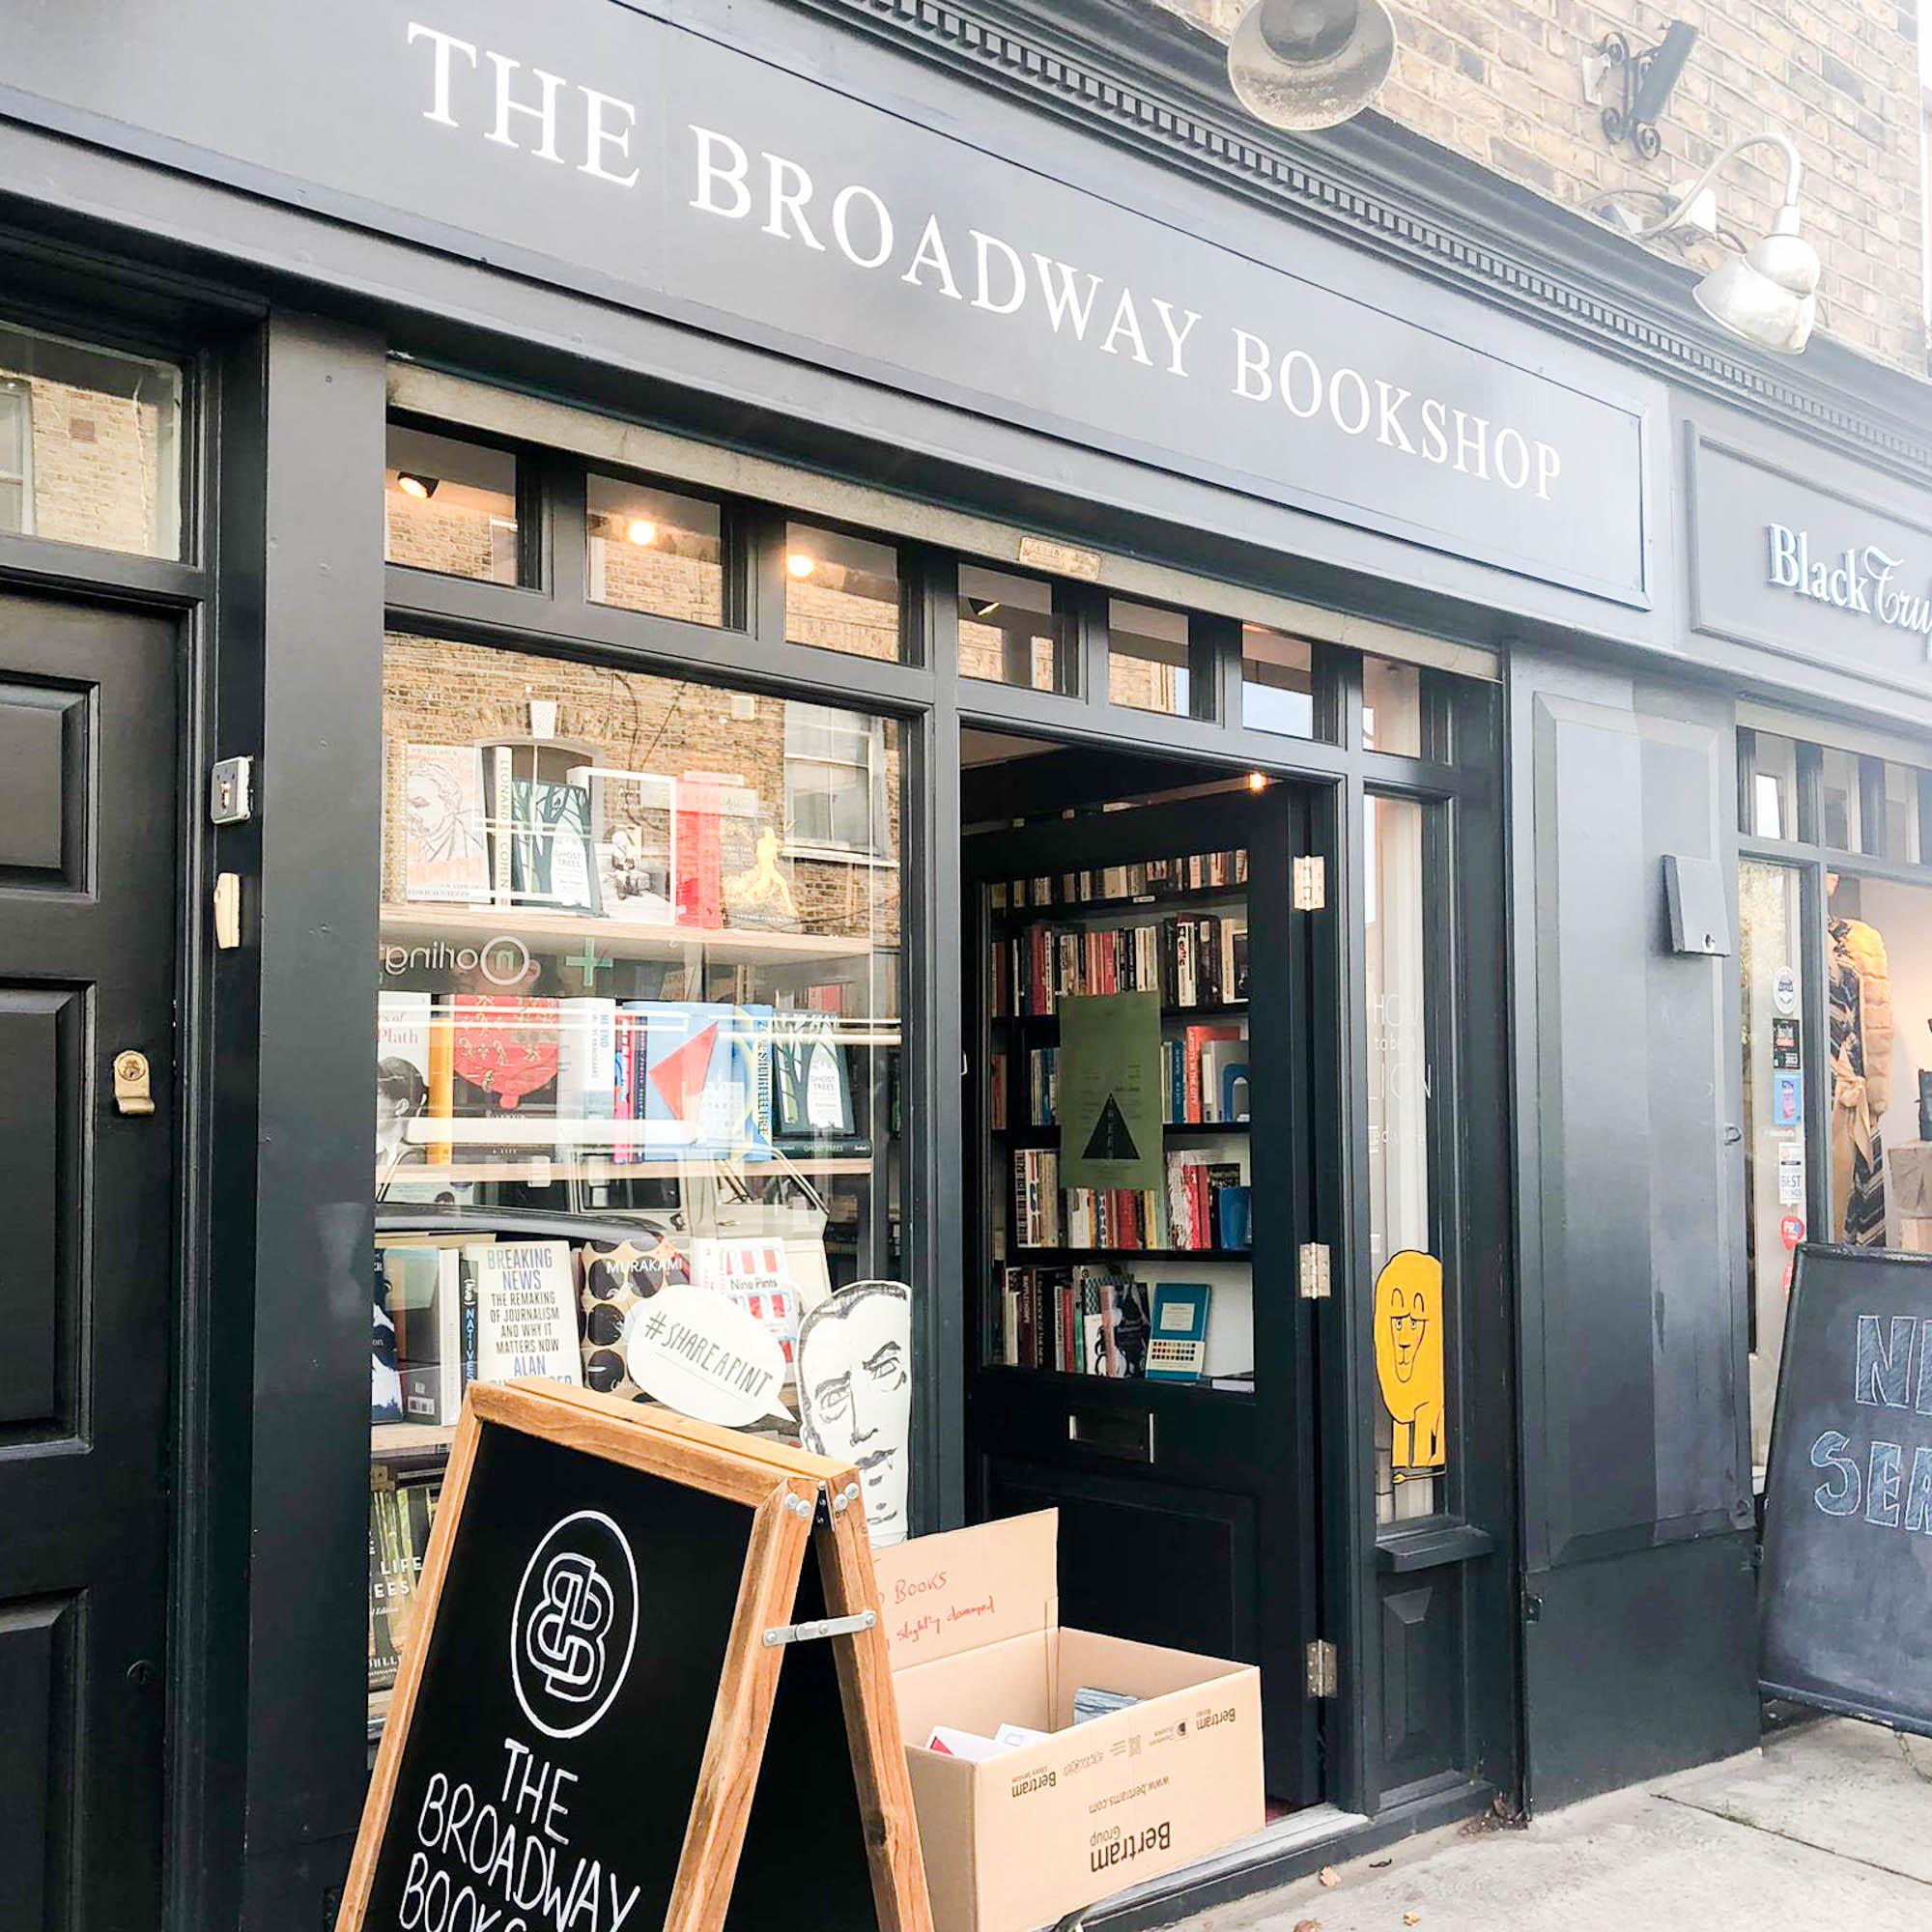 The Broadway Bookshop